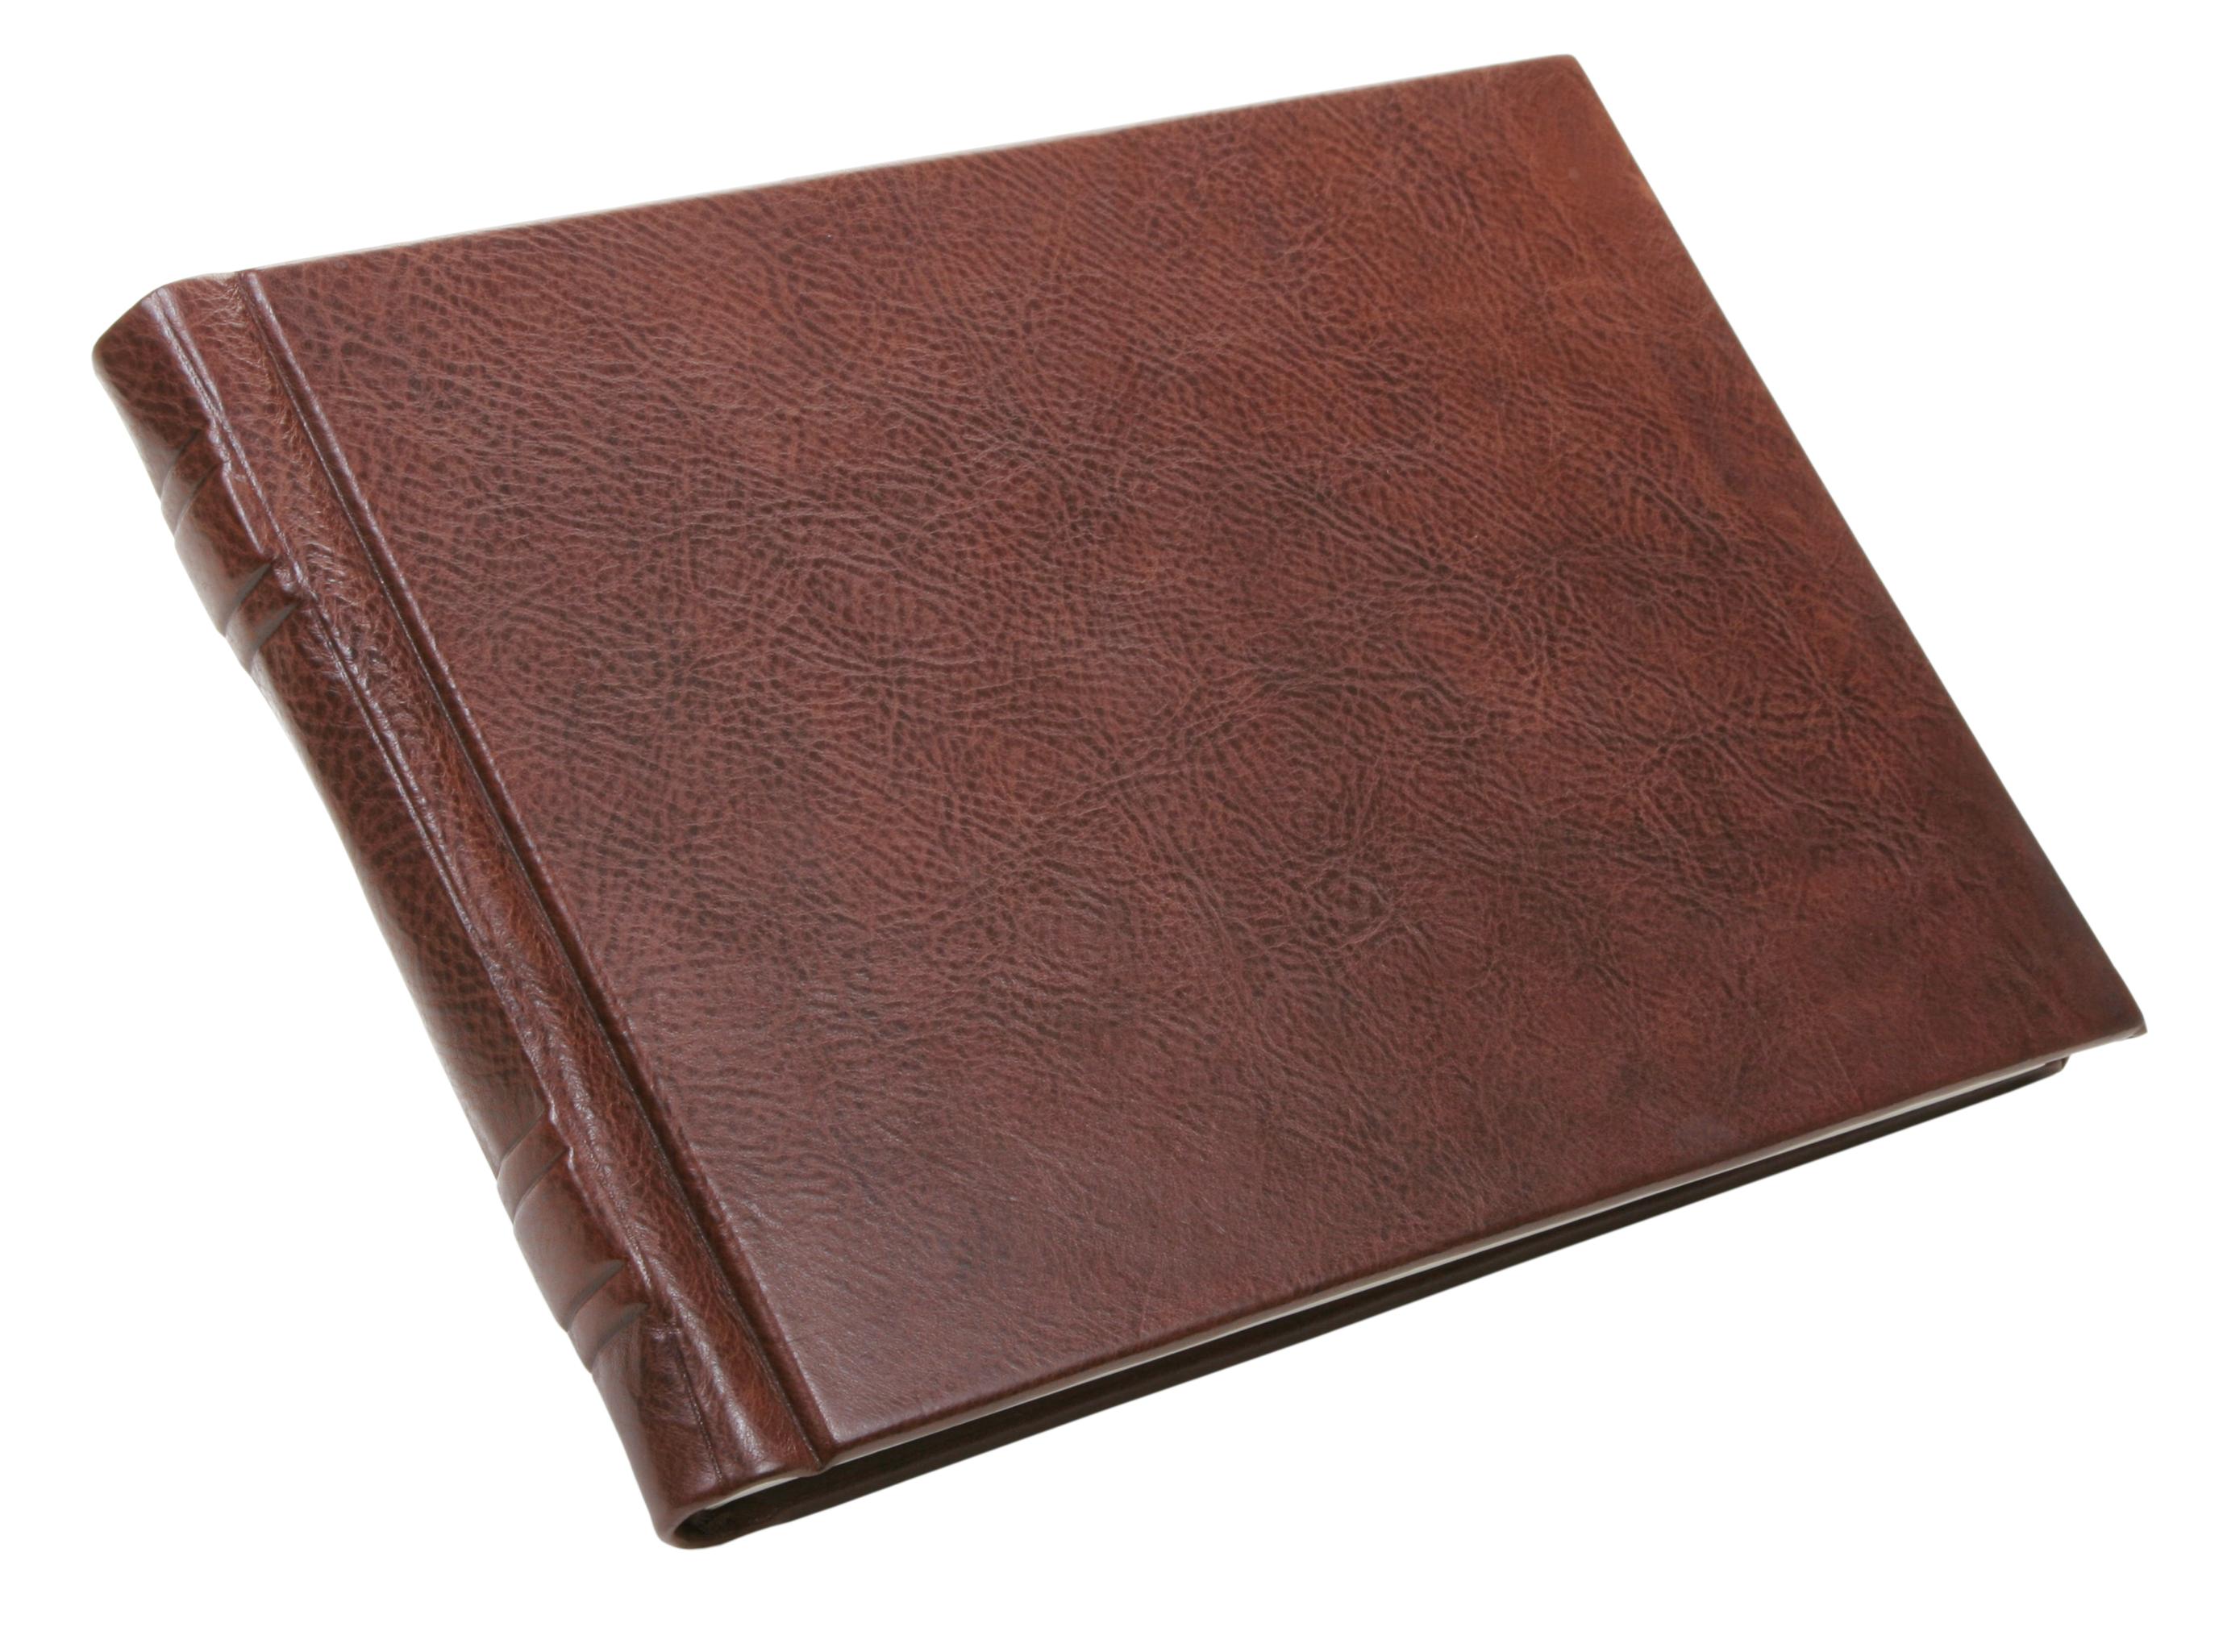 Leather Landscape Book